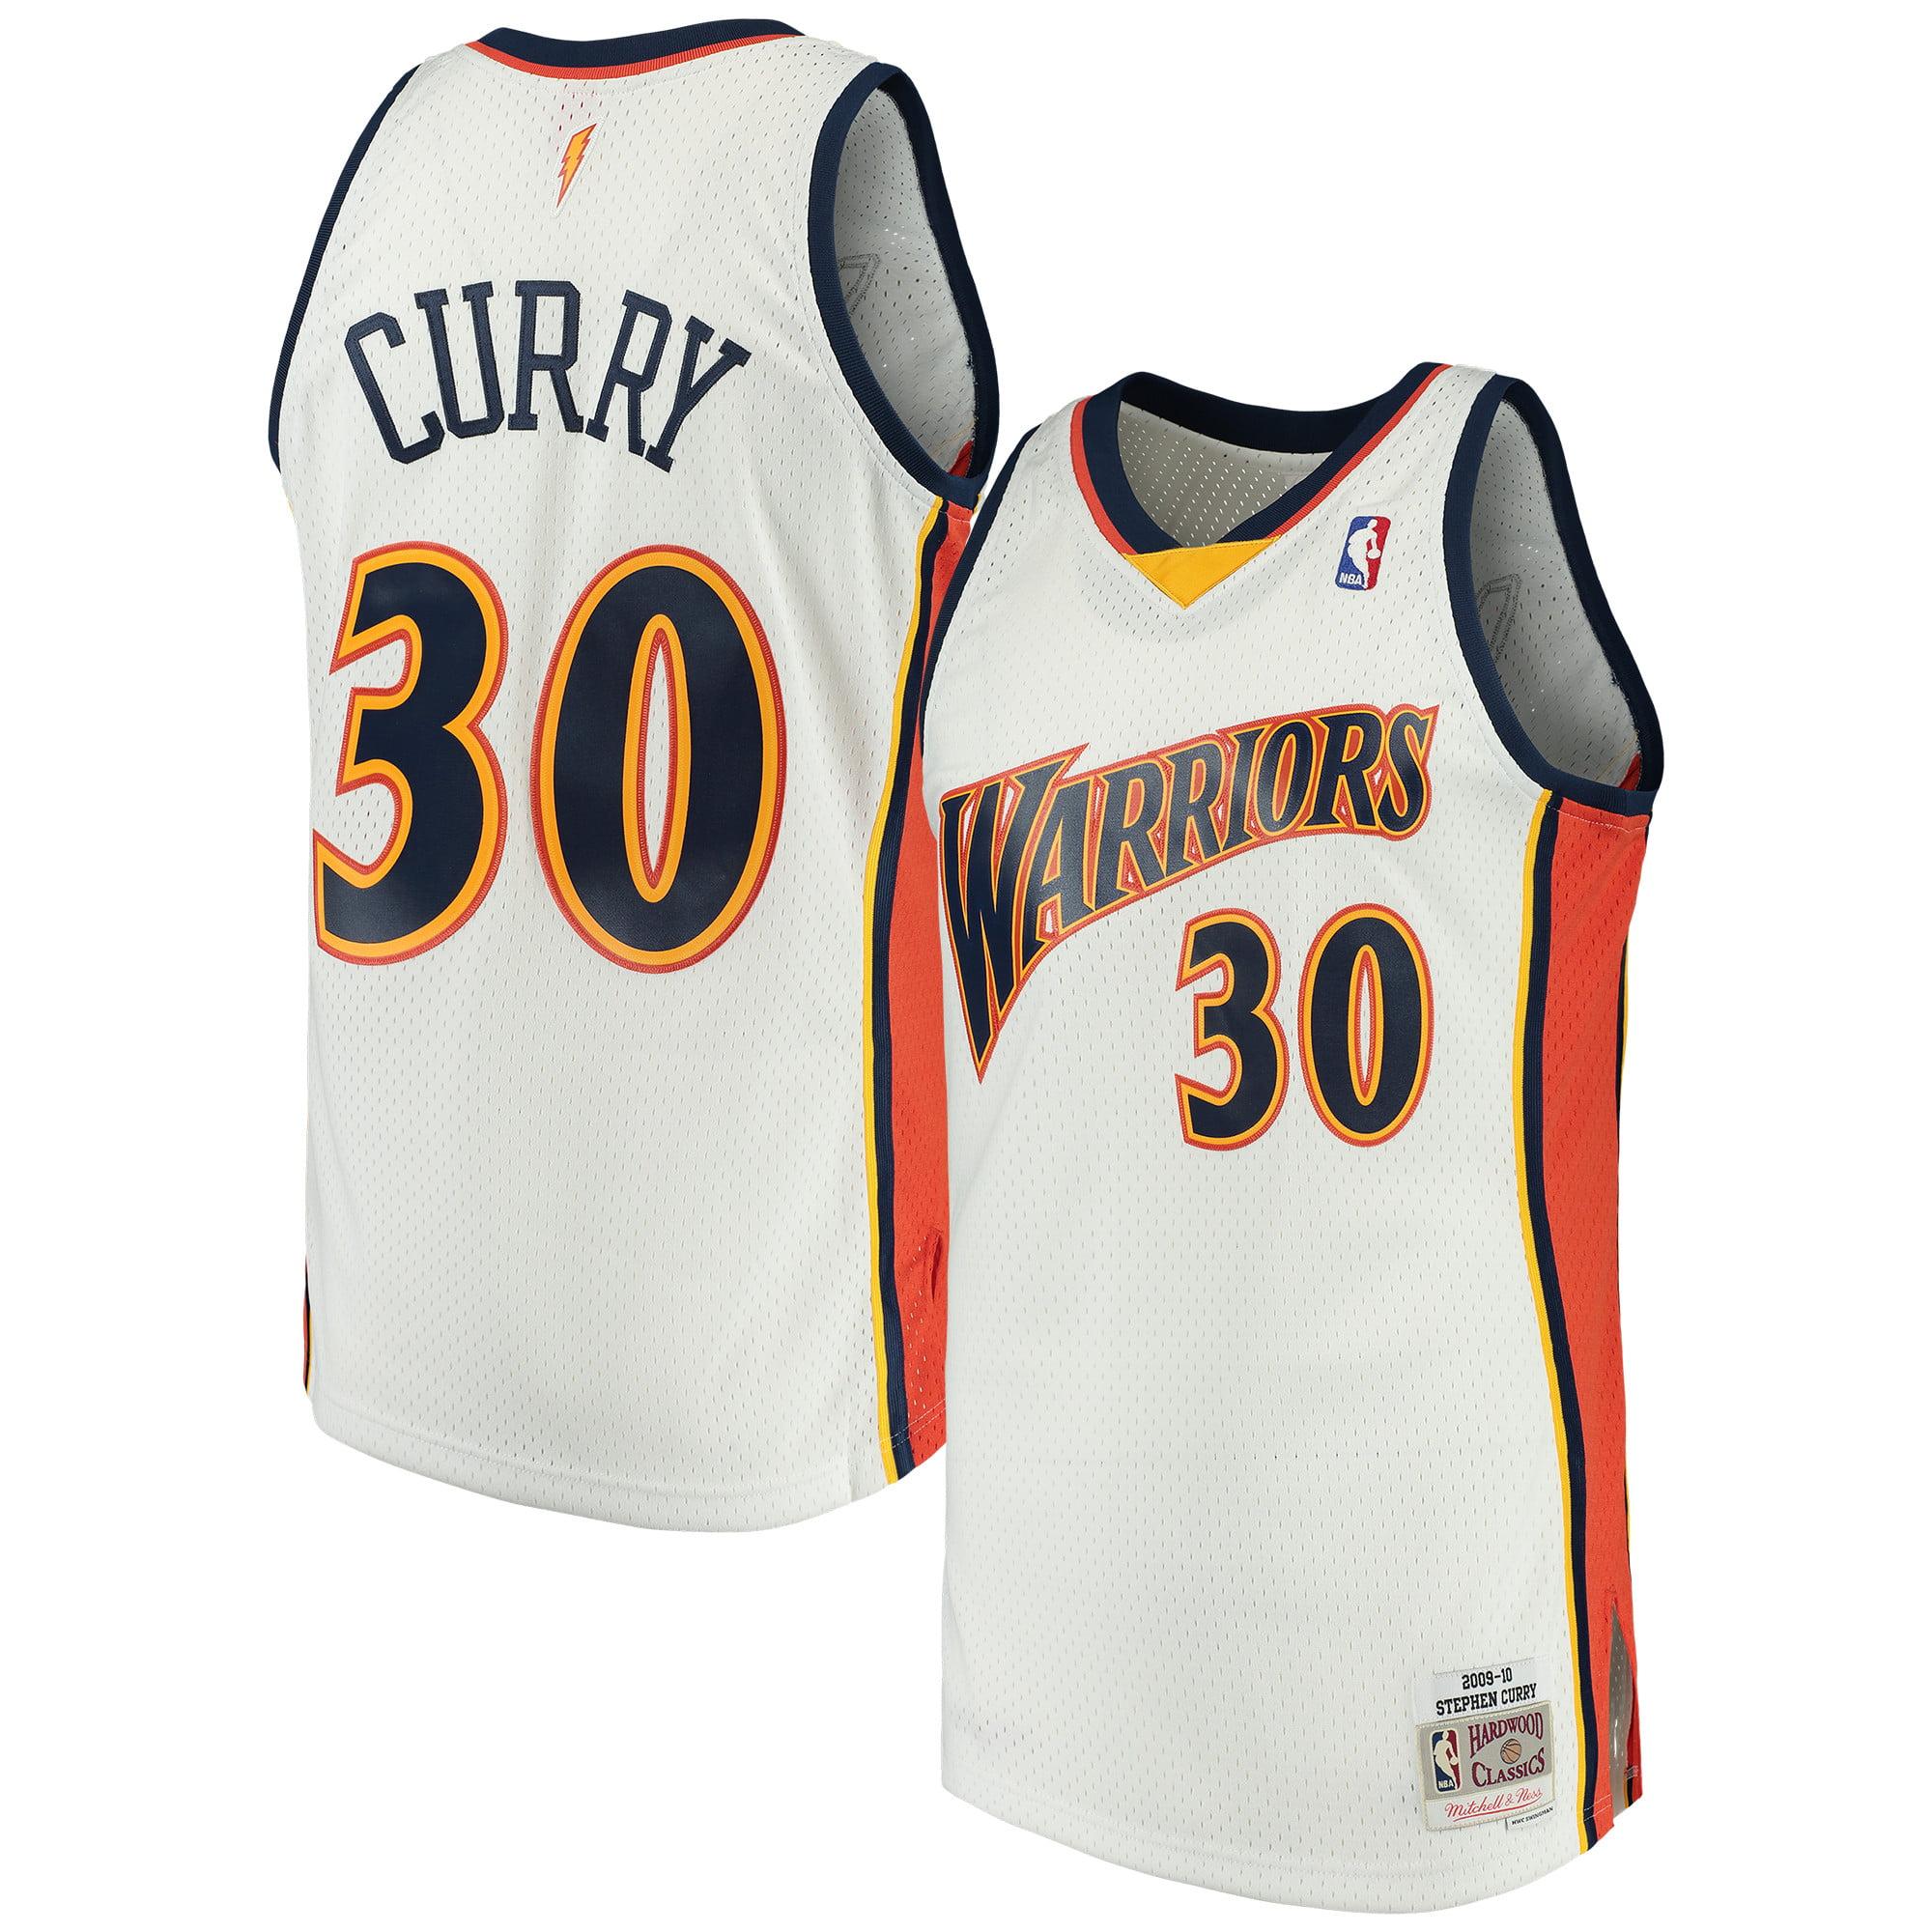 wholesale dealer 2ce36 682e5 Stephen Curry Golden State Warriors Mitchell & Ness Swingman ...